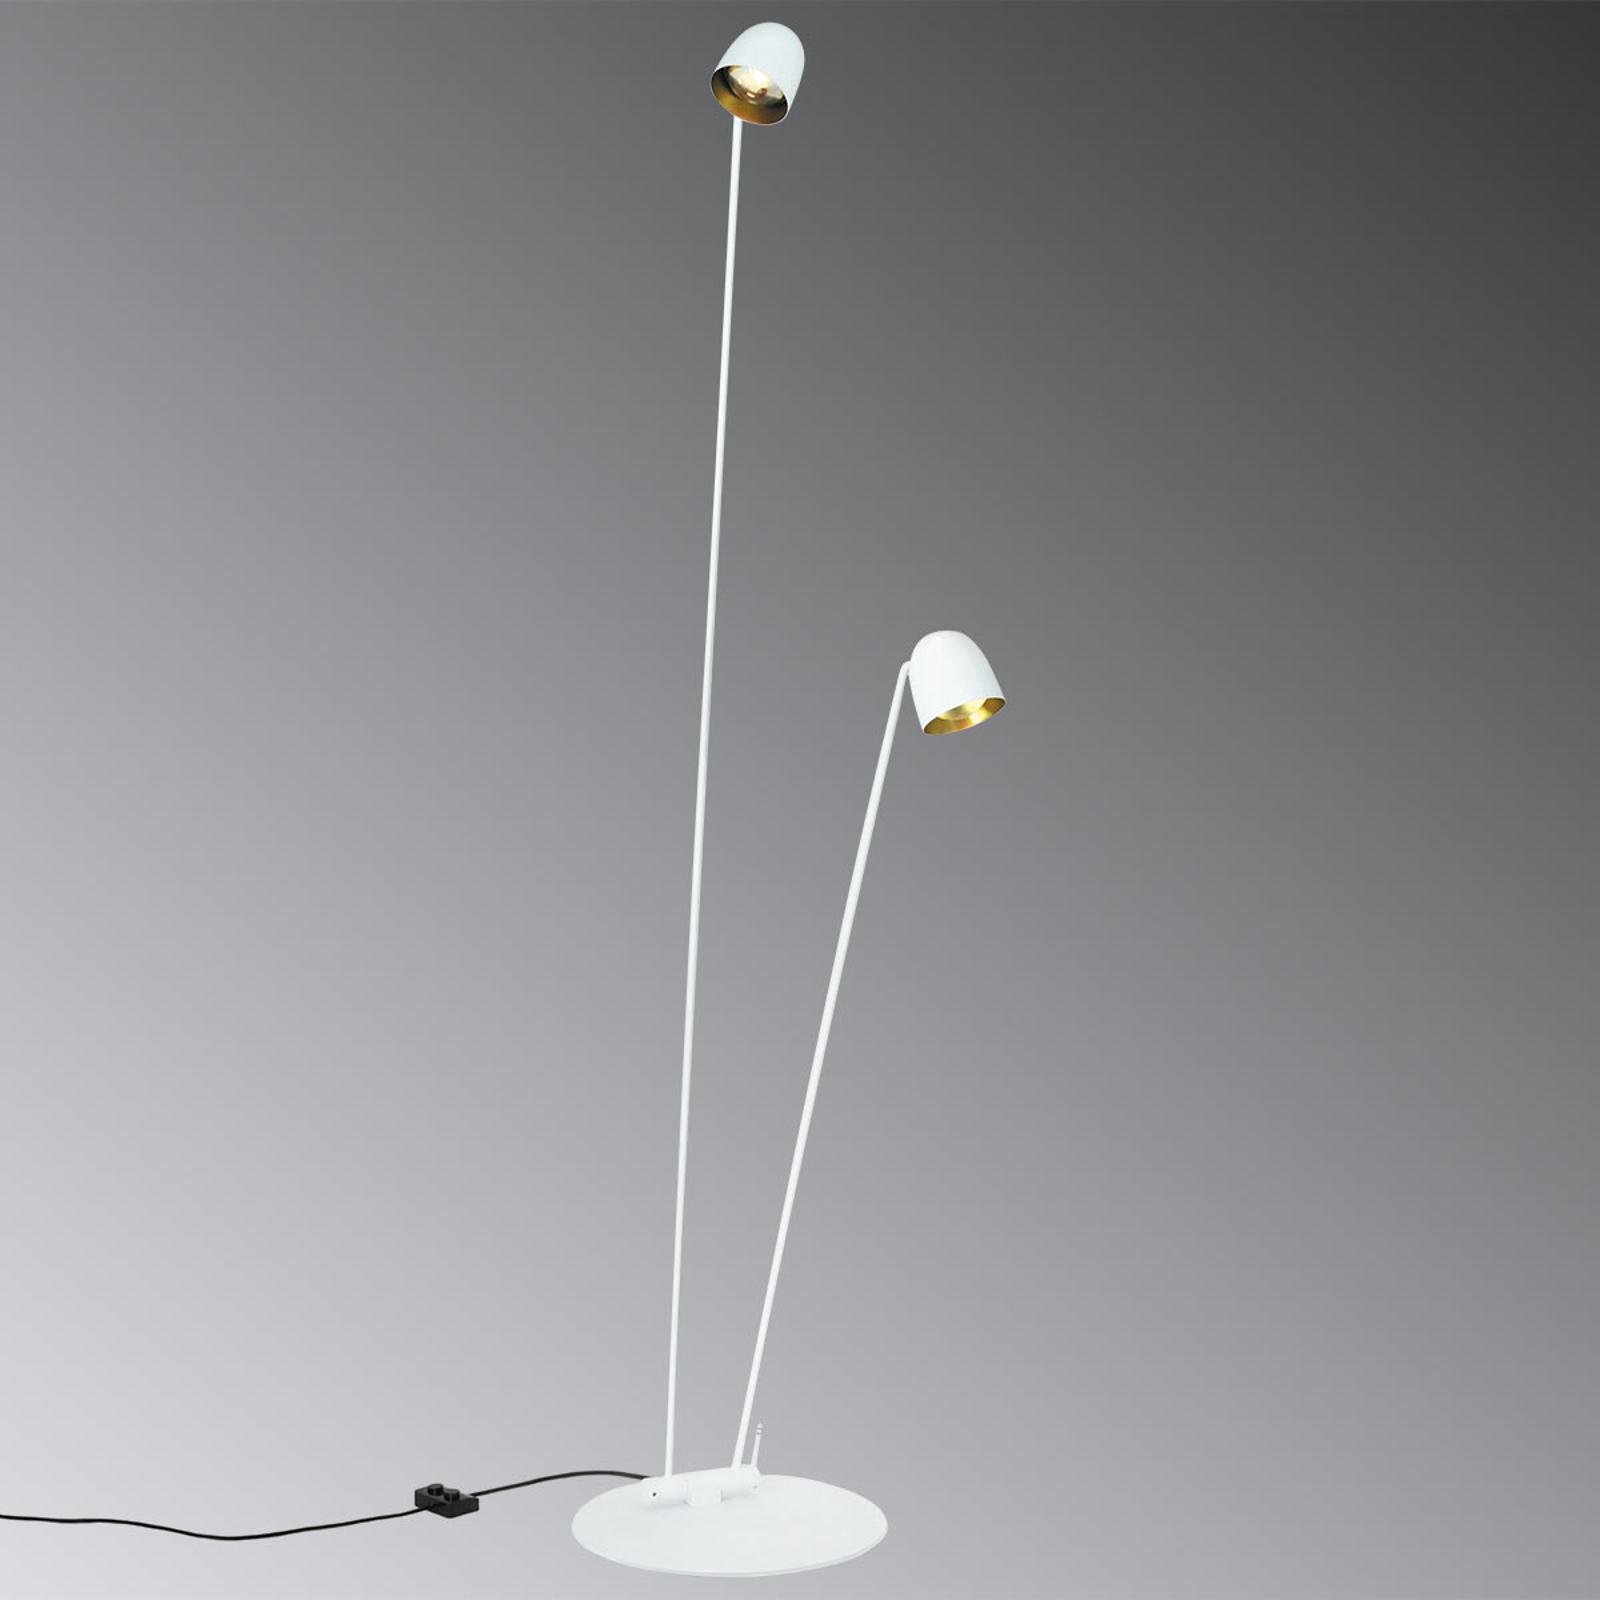 Lampadaire LED orientable Speers F blanc